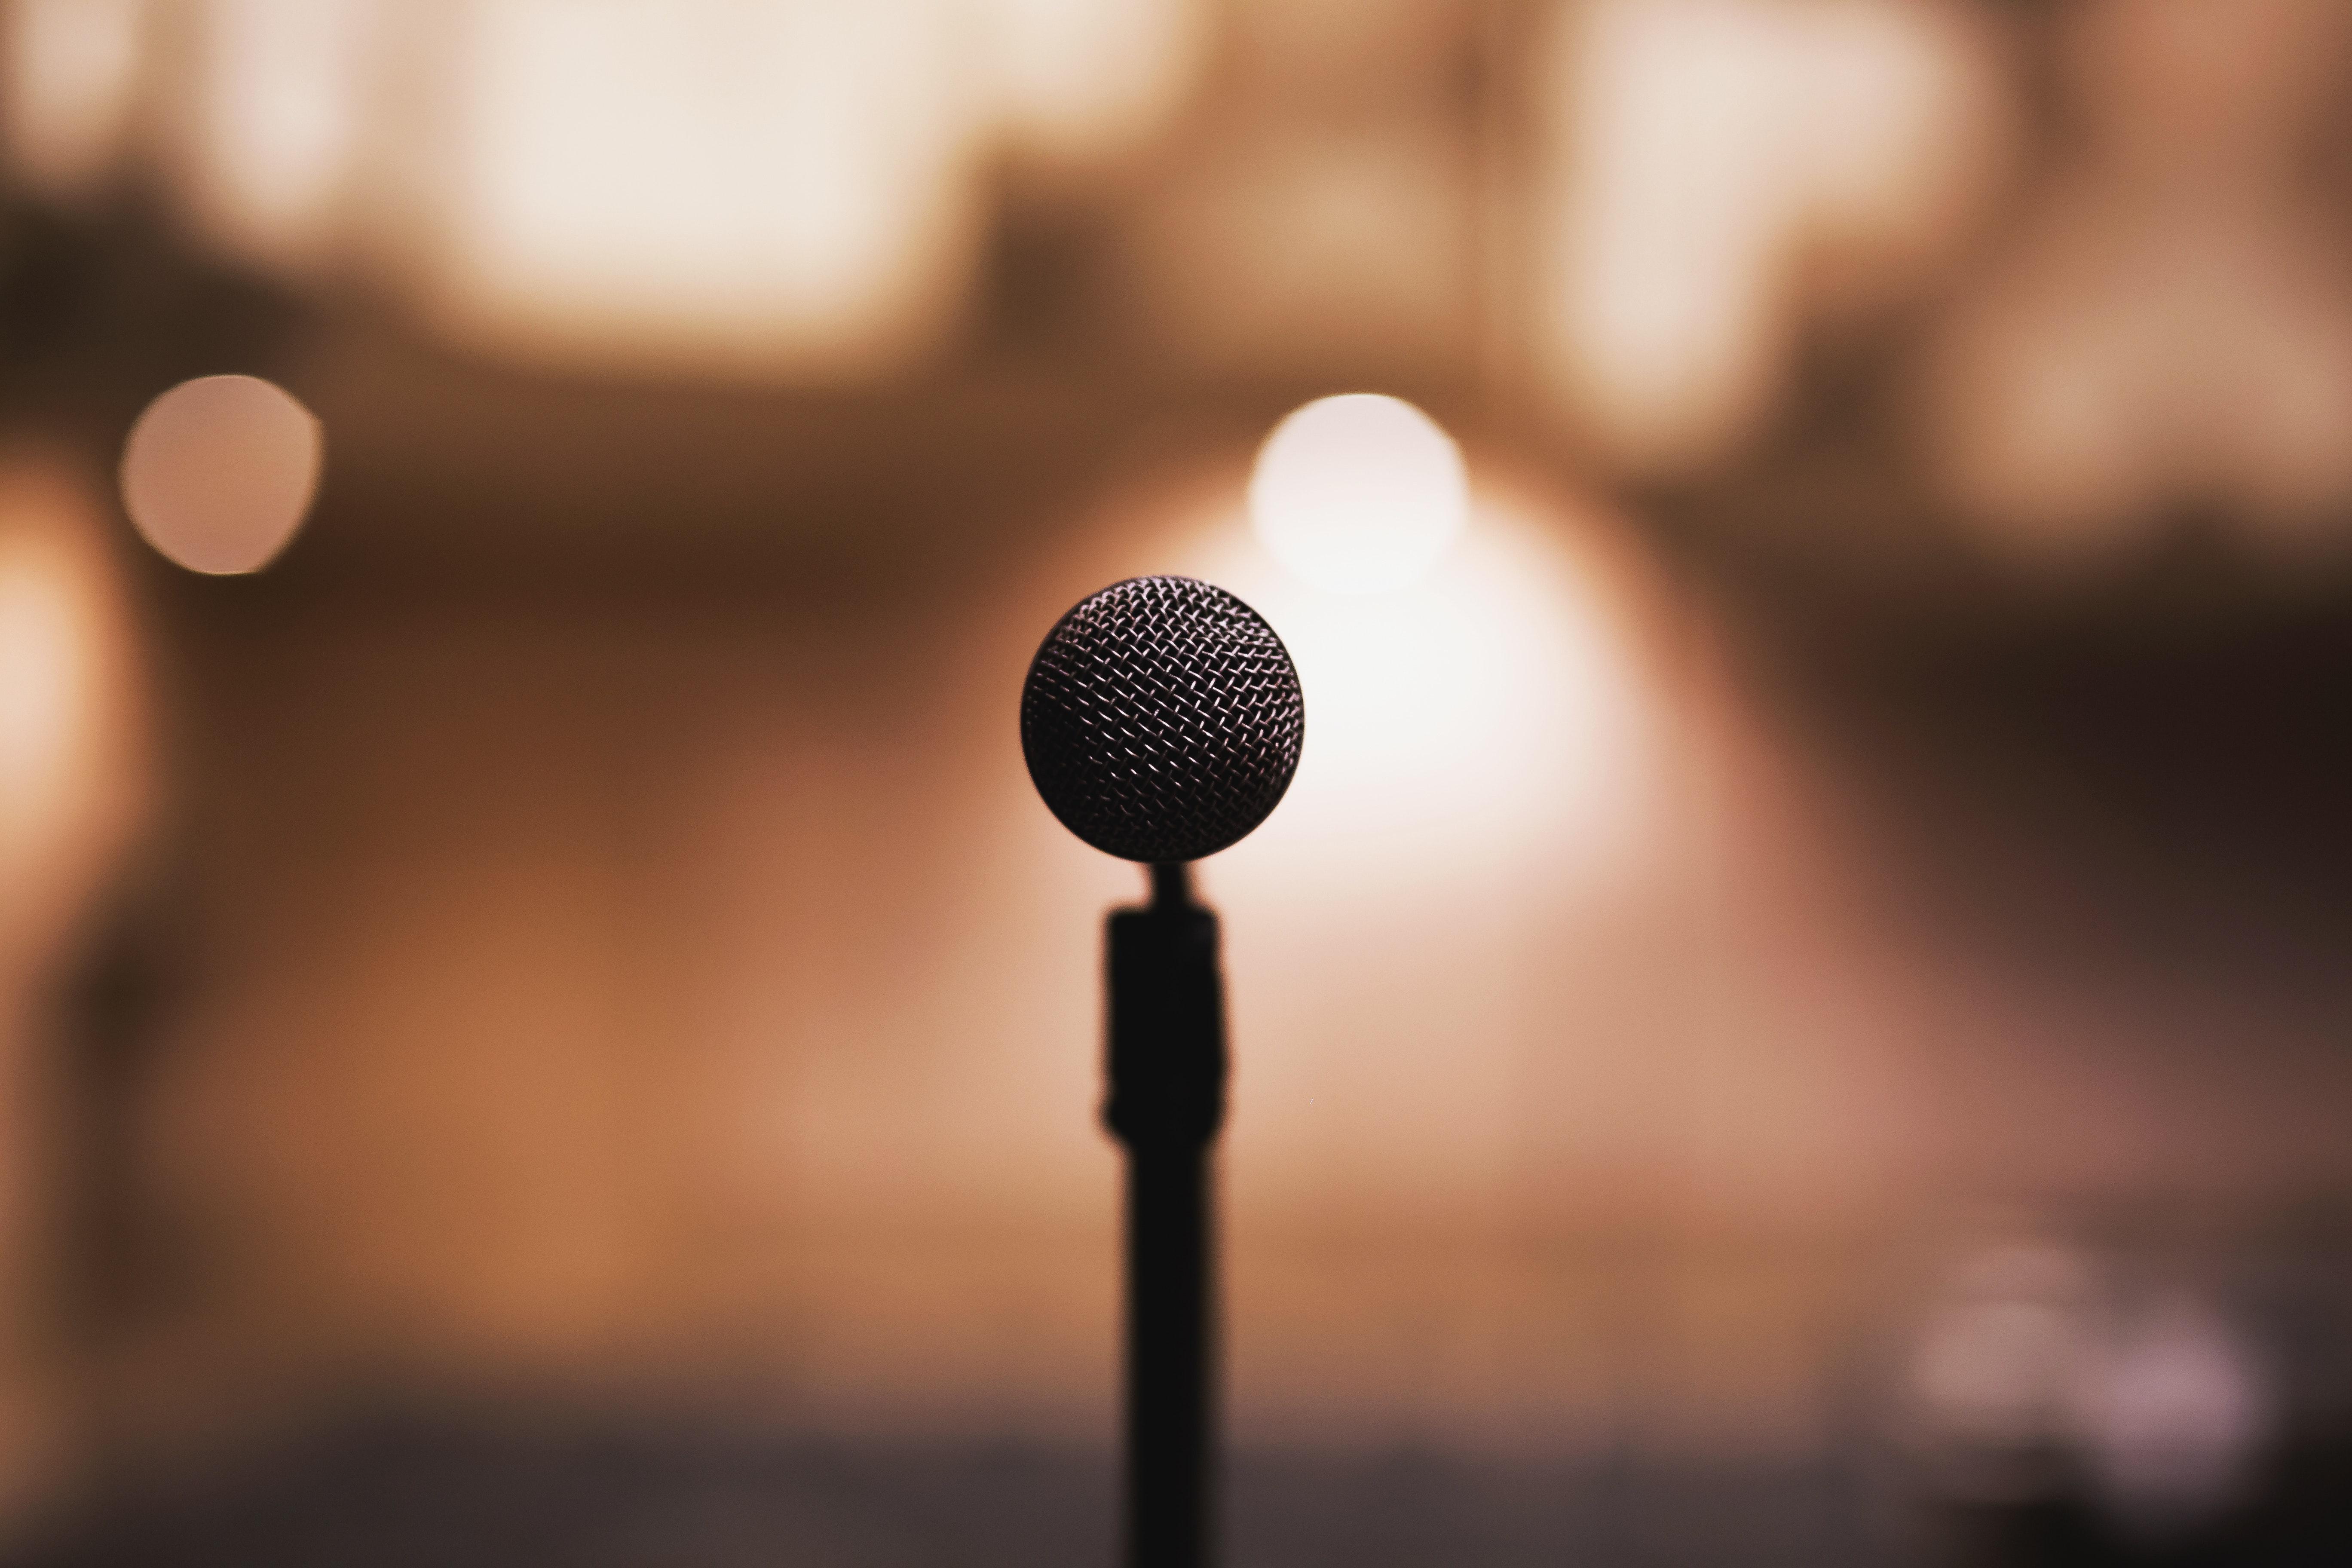 Hype um Podcasts – was steckt dahinter?